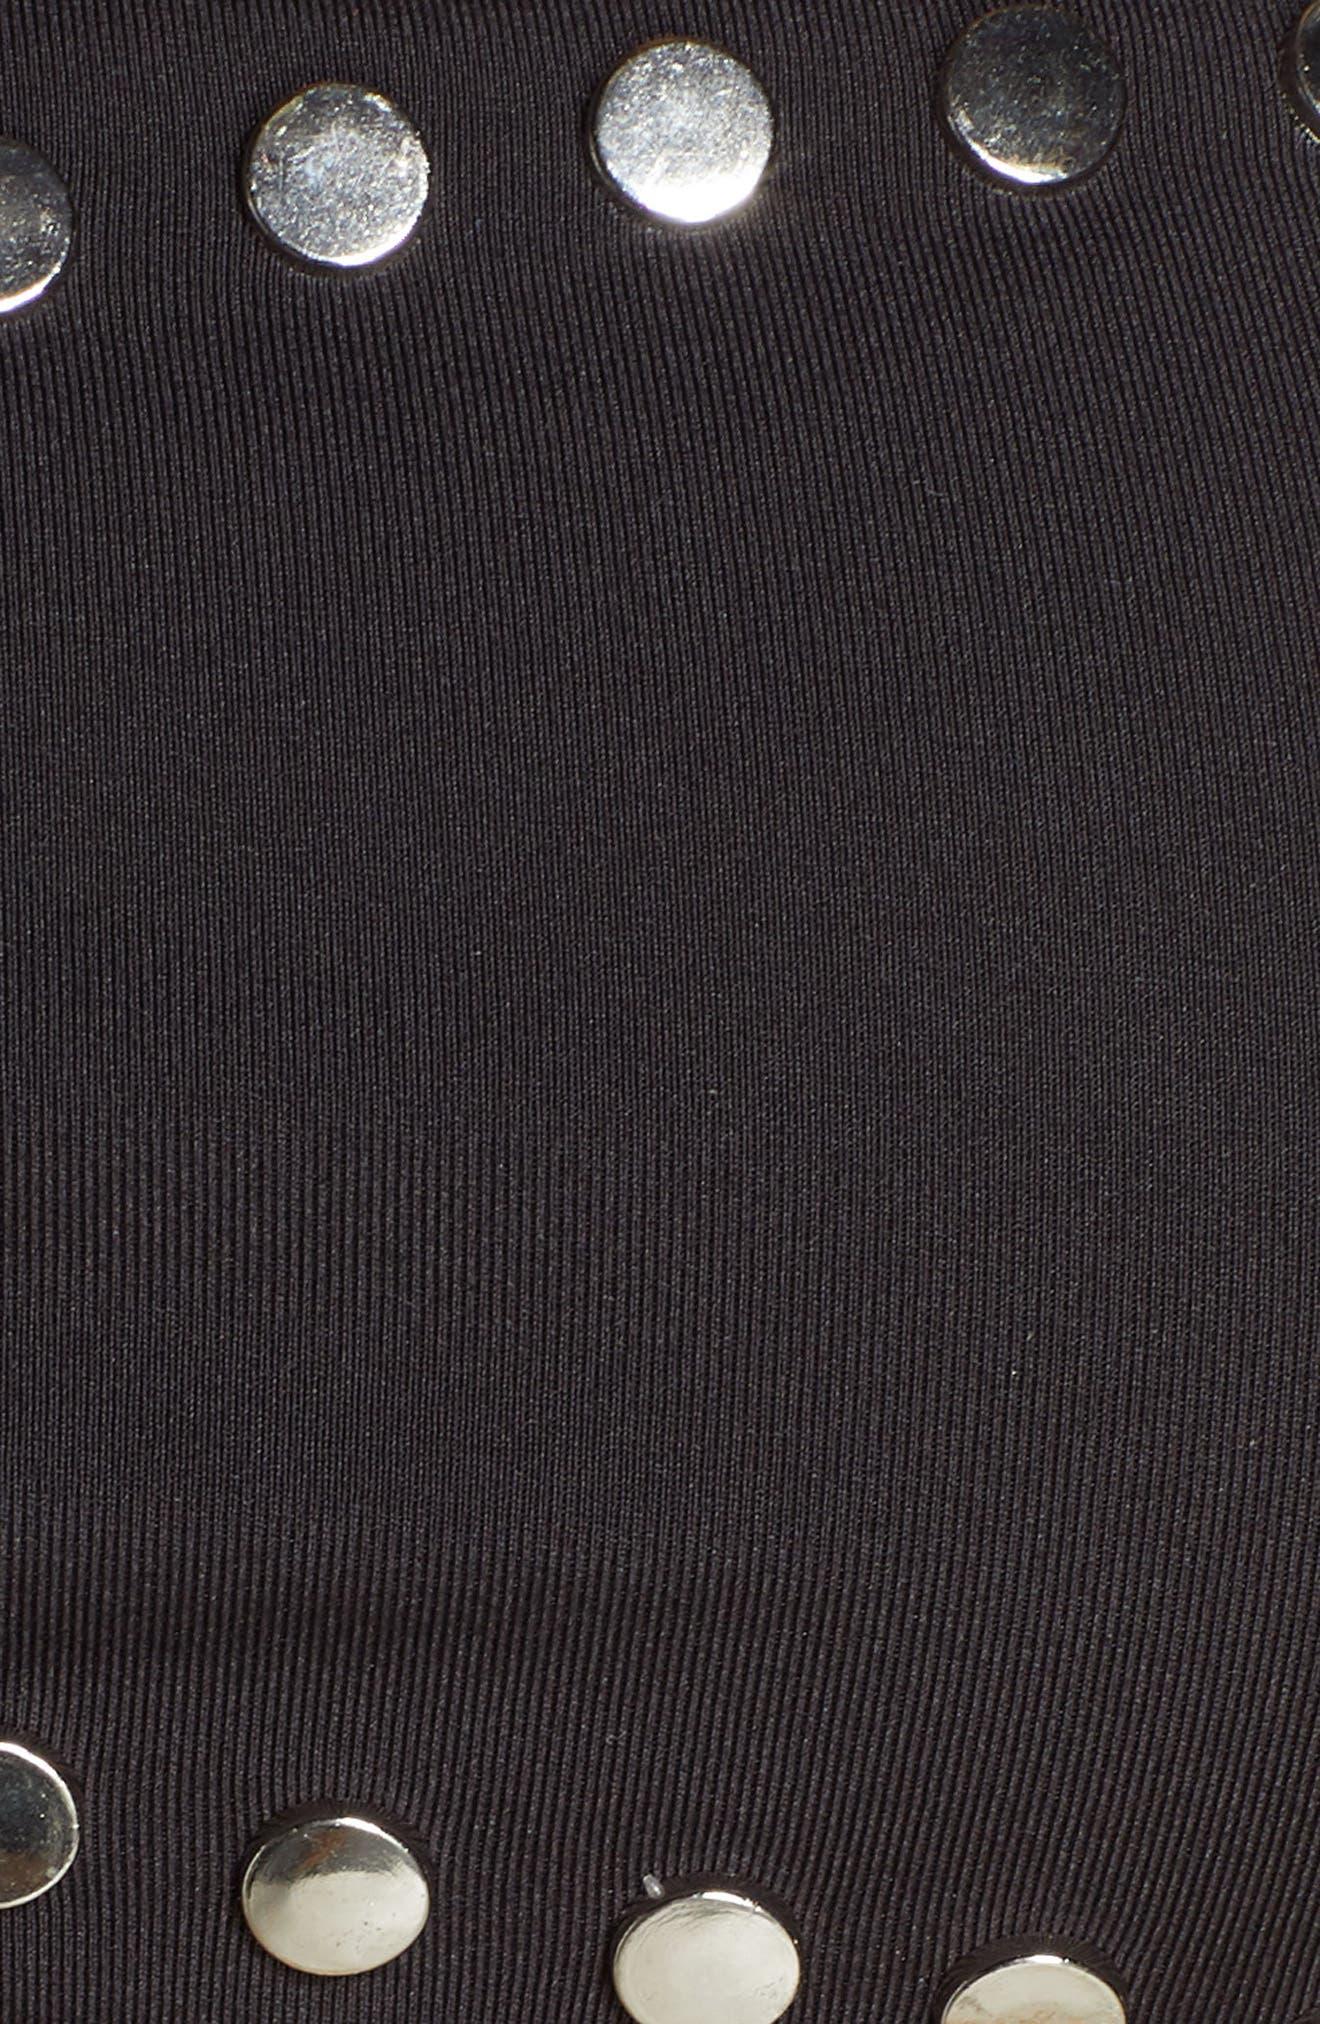 DOLCE VITA, Stellar Studs Bandeau Swim Top, Alternate thumbnail 7, color, BLACK